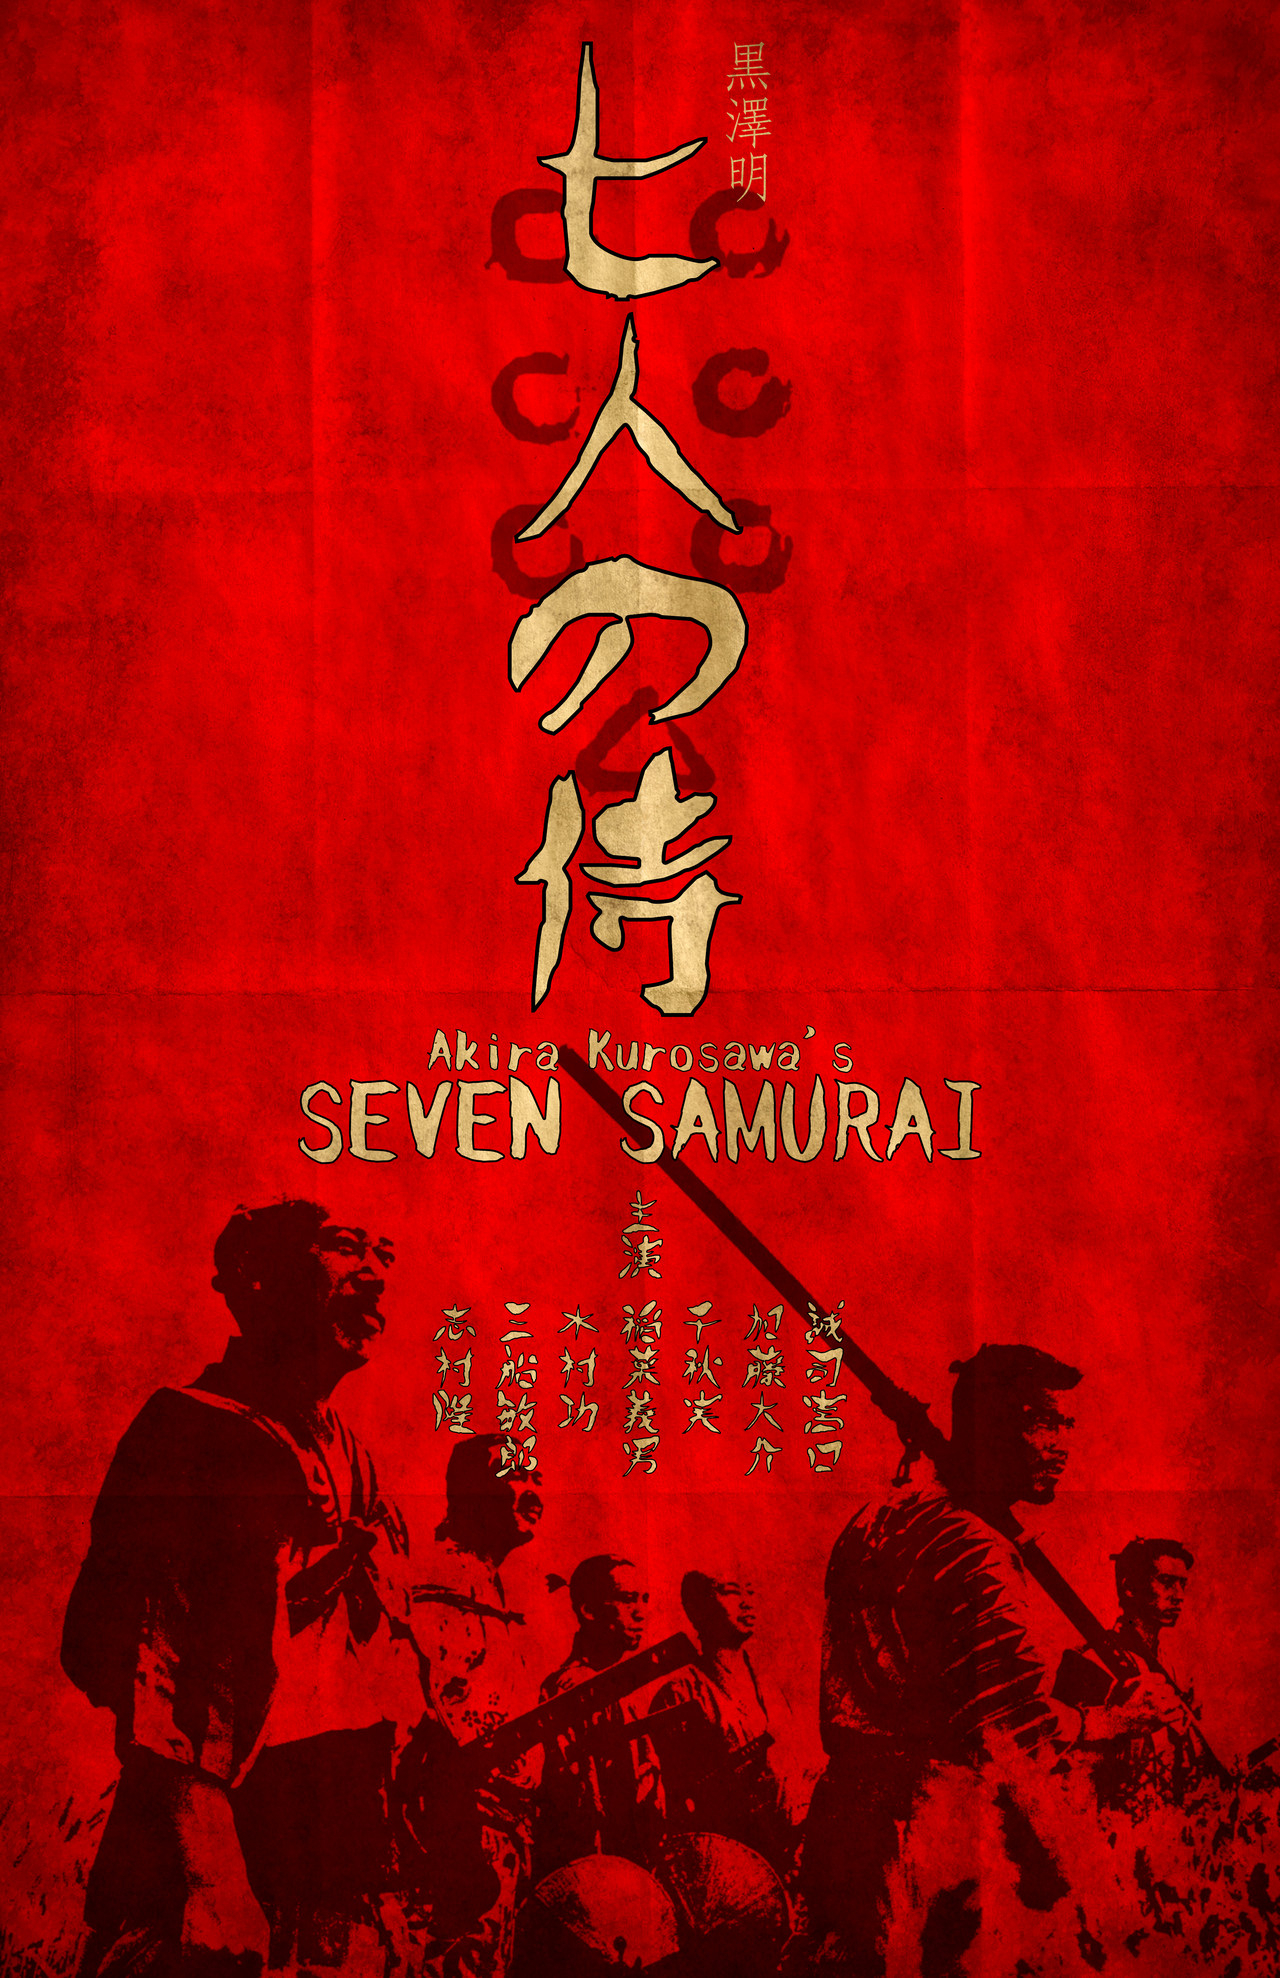 … Seven Samurai Poster LARGE by tikiman-akuaku